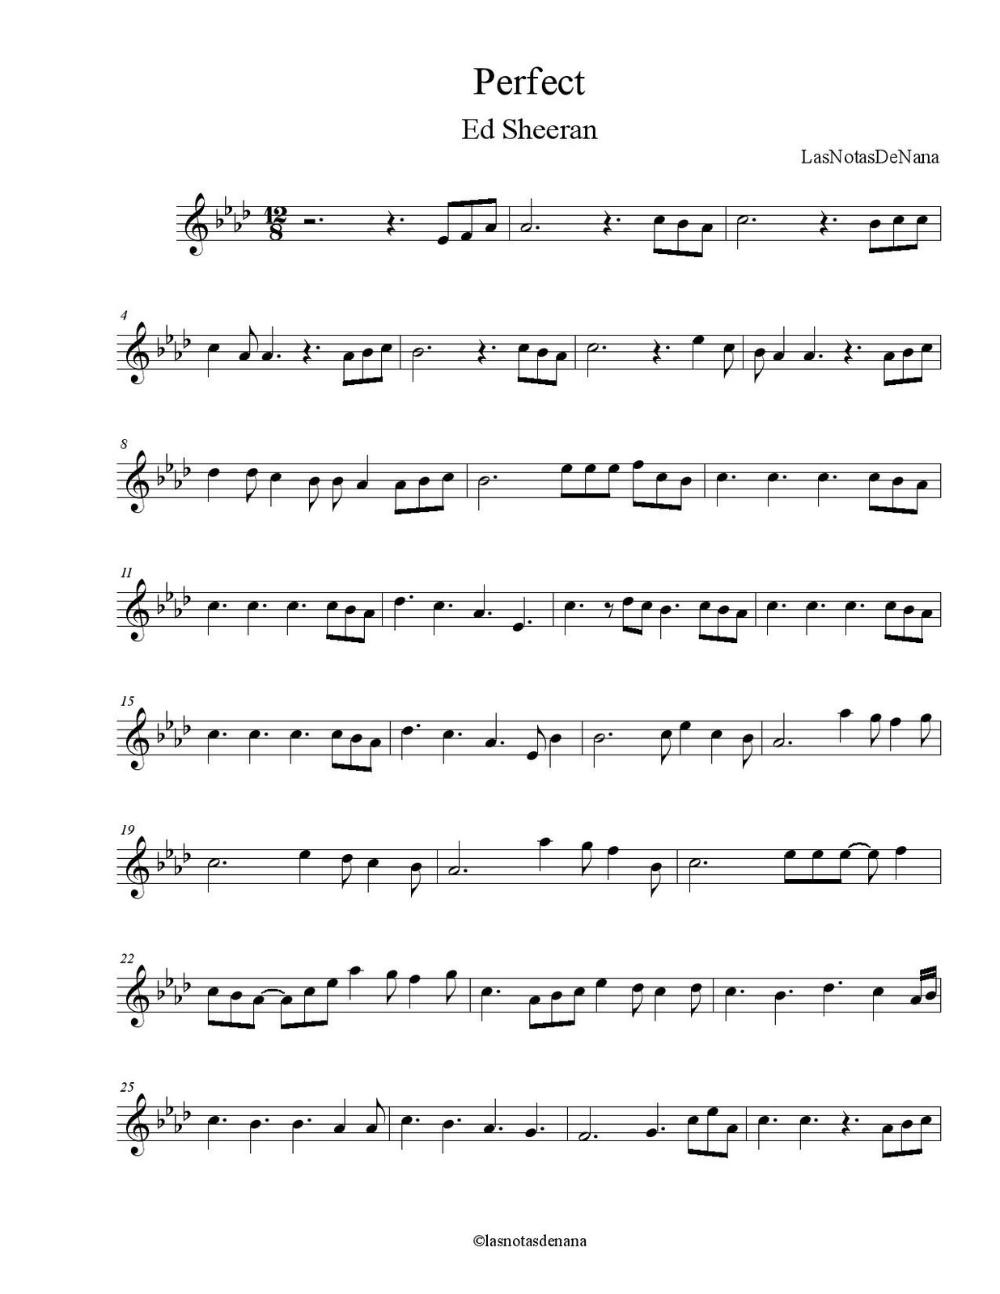 Partitura De La Cancion Perfect In 2020 Violin Sheet Music